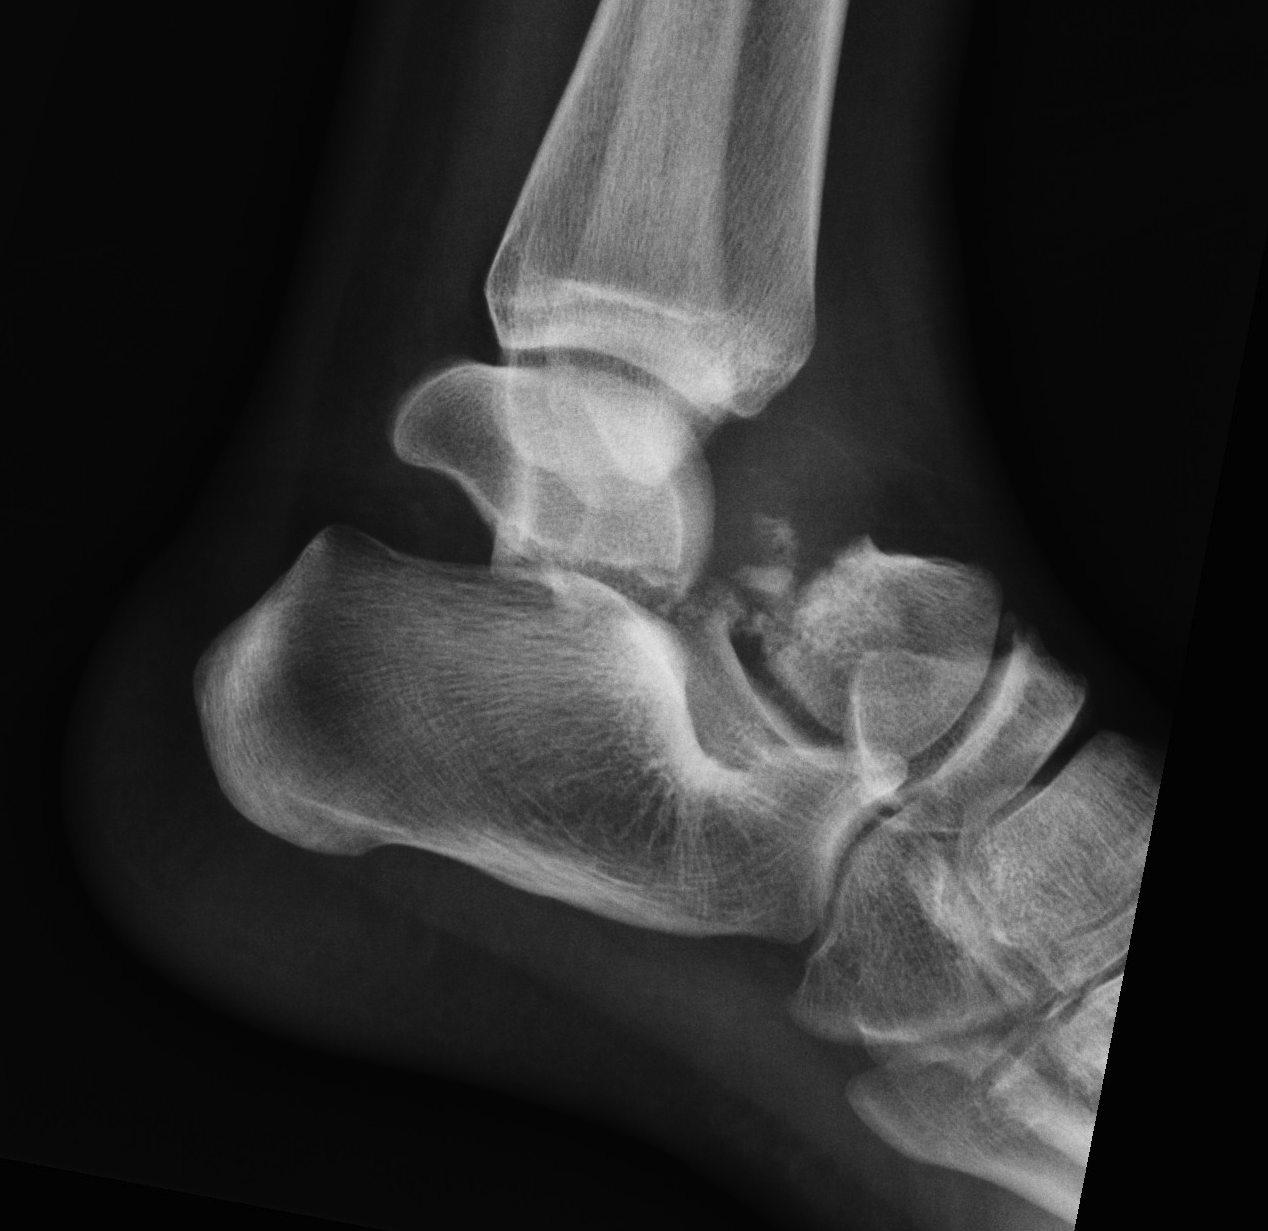 Talar Neck Fracture The Bone School